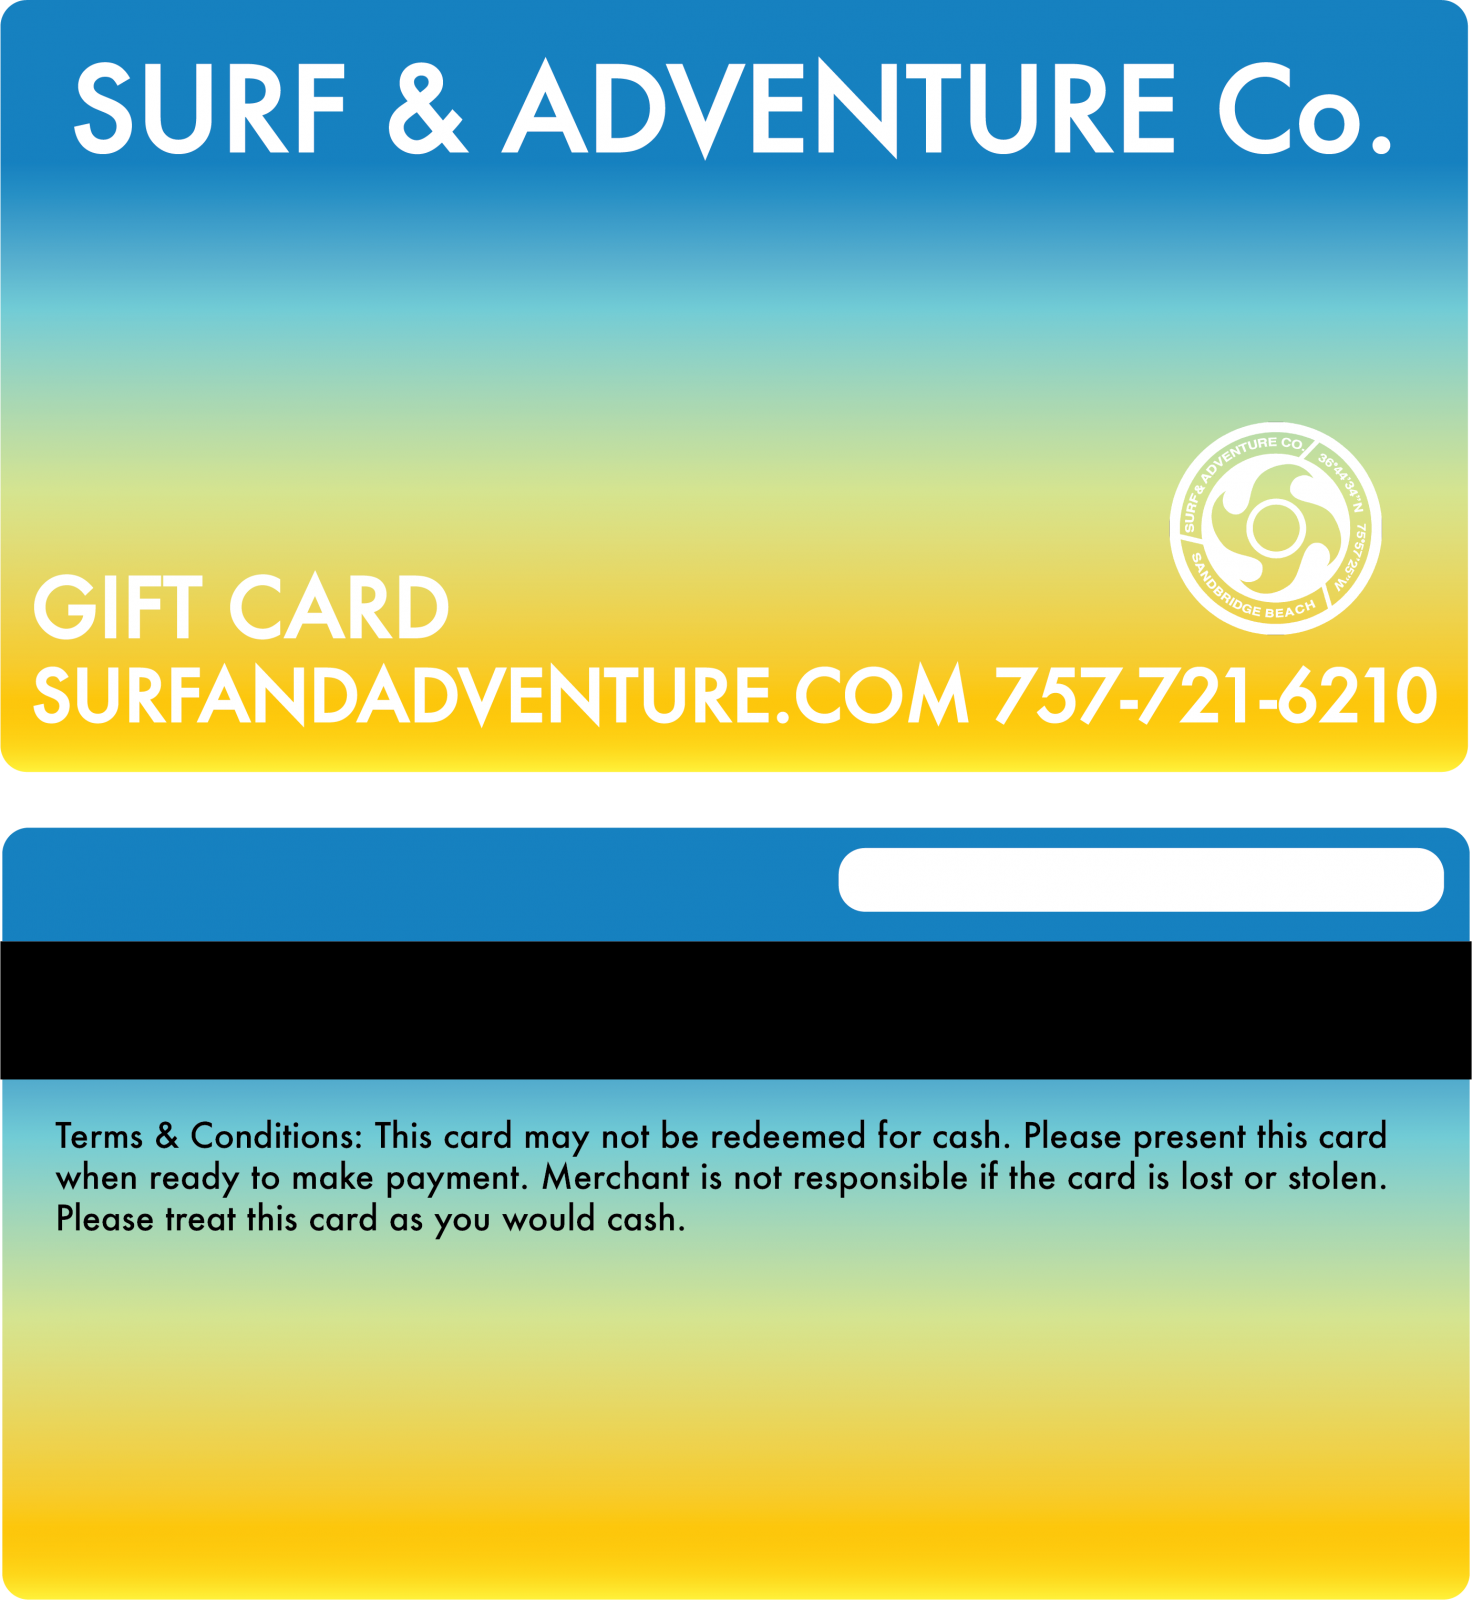 Surf & Adventure Gift Card